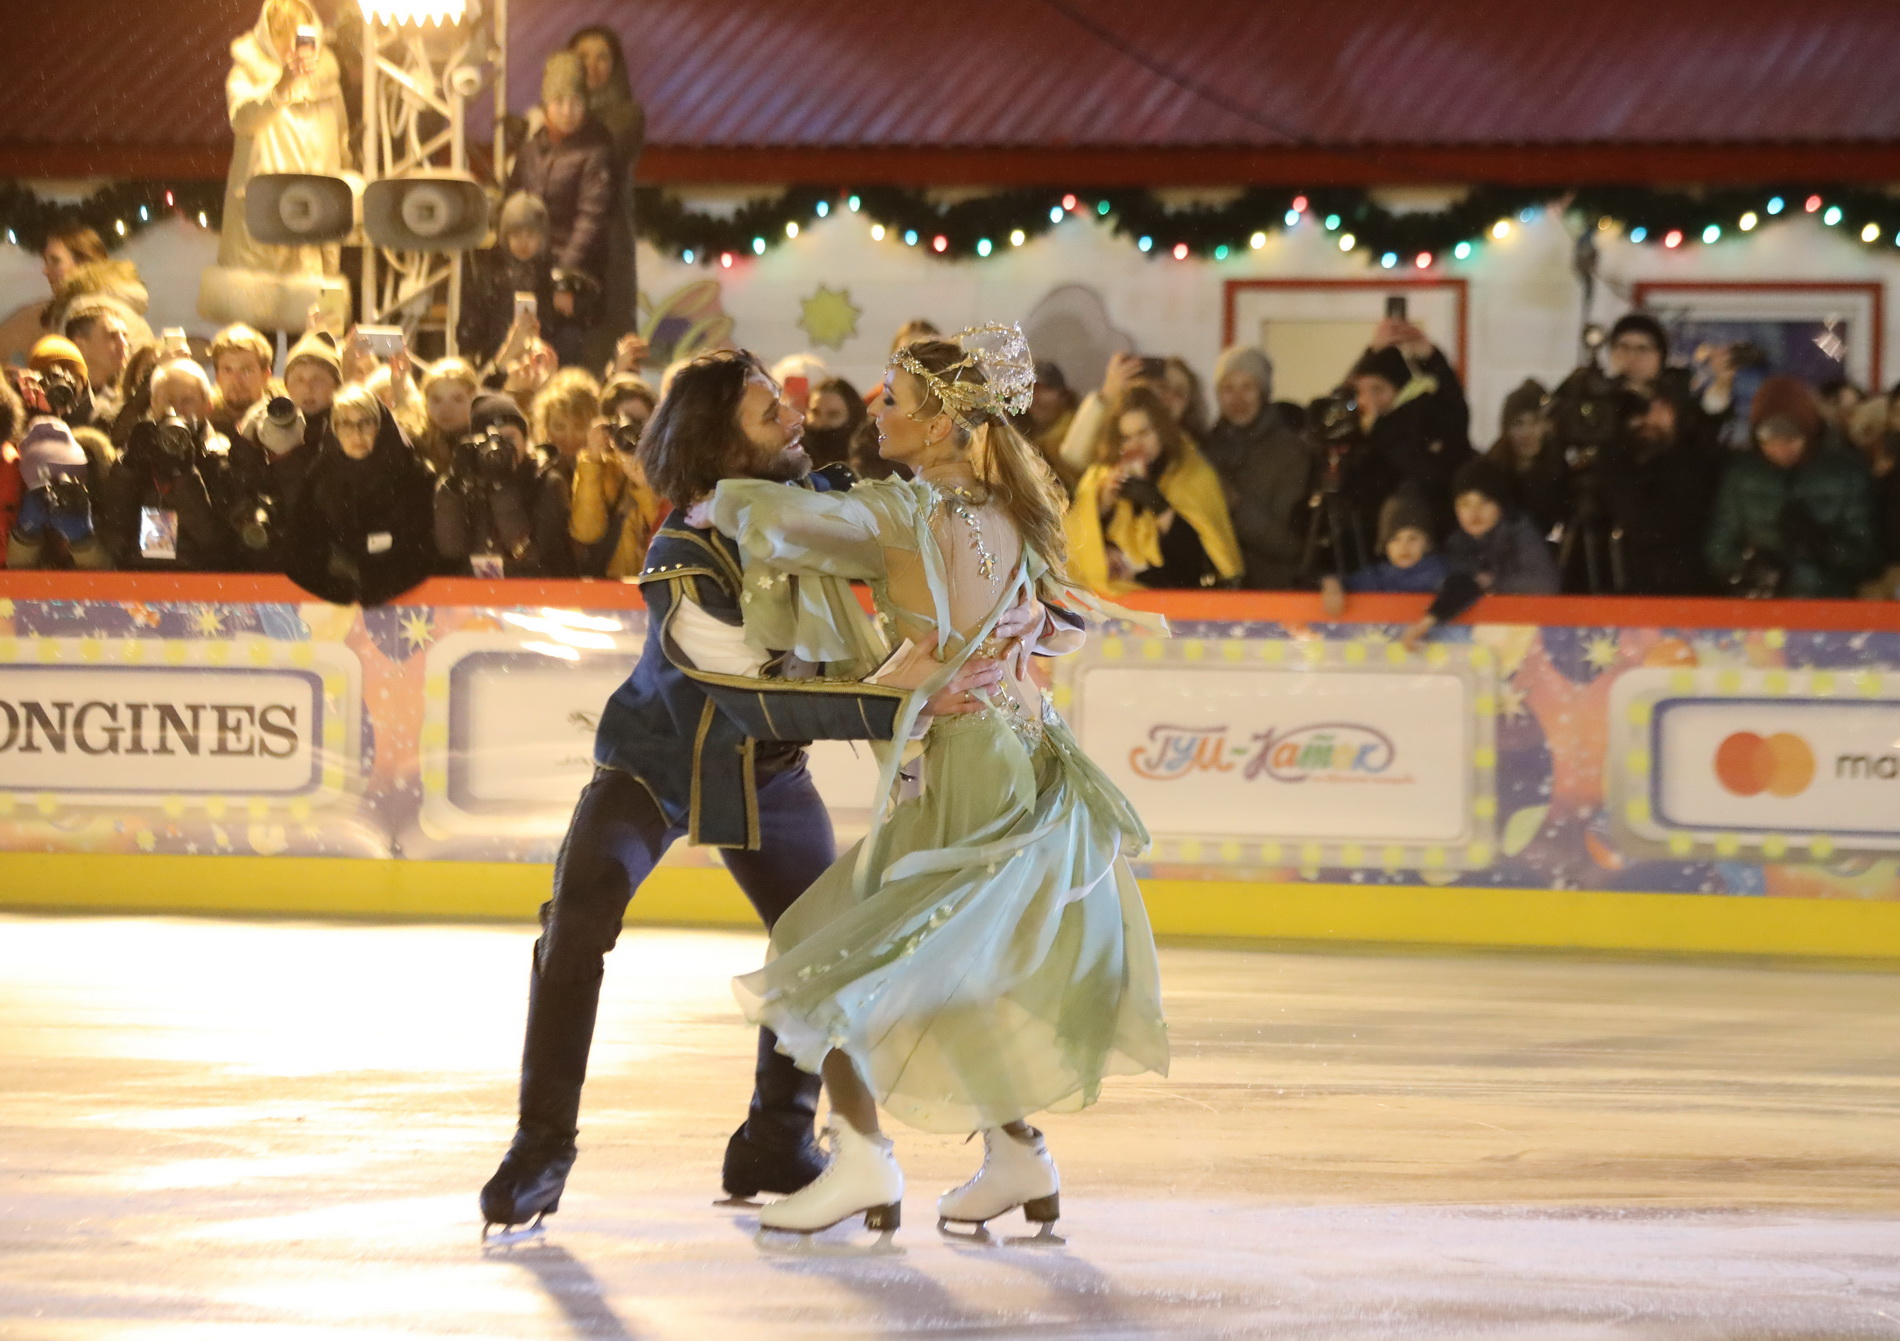 Ледовые шоу-2018-2019 - Страница 12 Tatyana-navka-i-petr-chernyshev-3042359